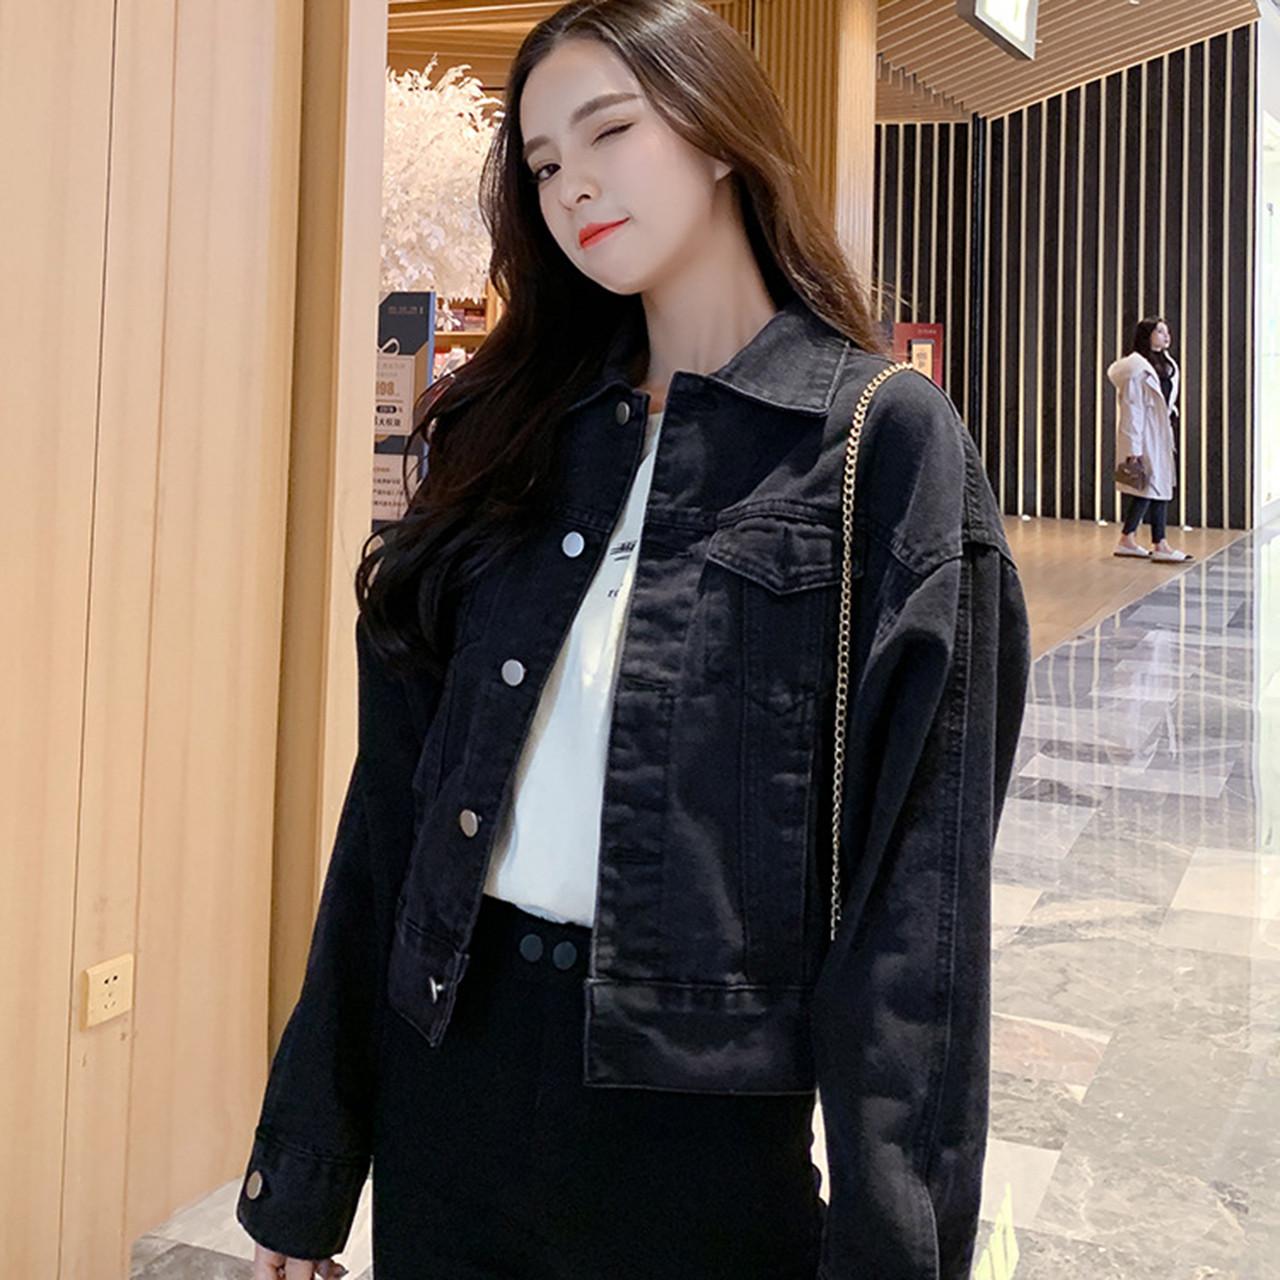 Куртка жіноча джинсова коротка чорна Girl #76 S